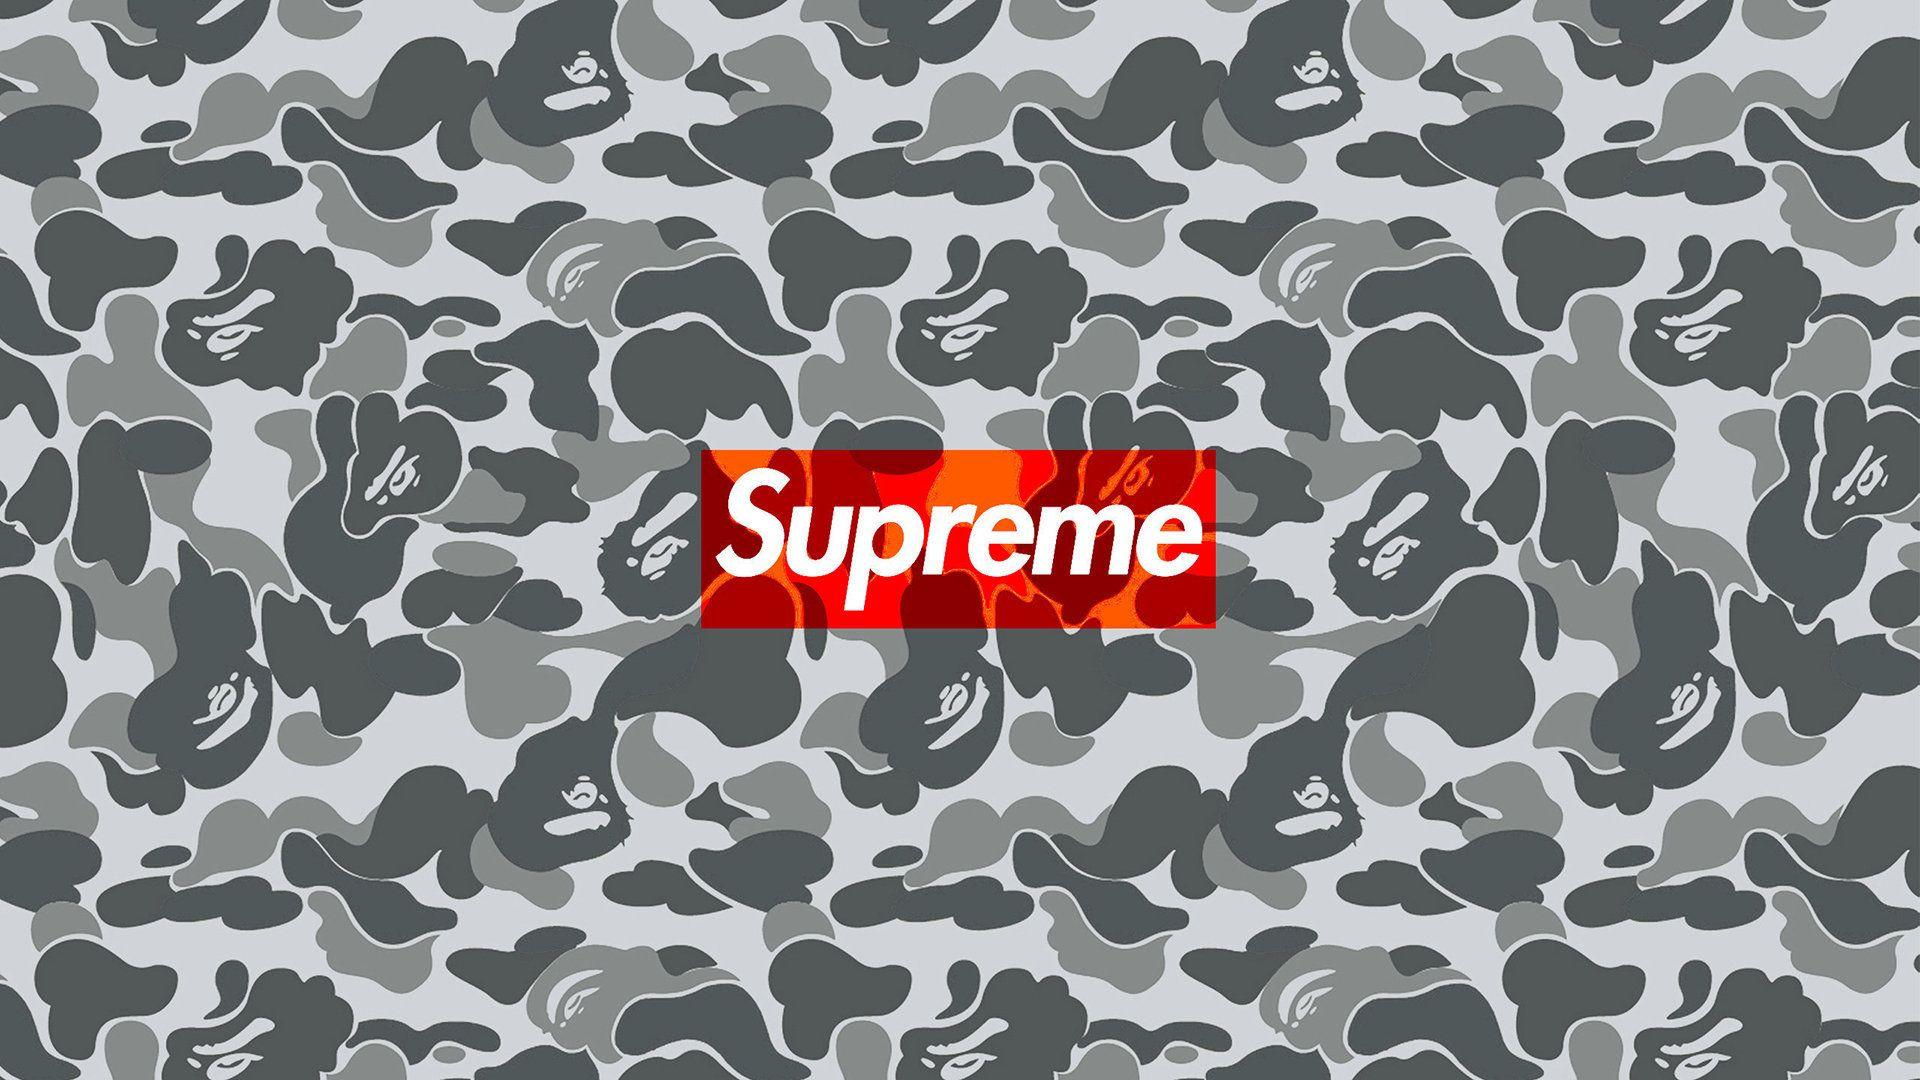 Supreme Ipad Wallpaper Hd Supreme Iphone Wallpaper Supreme